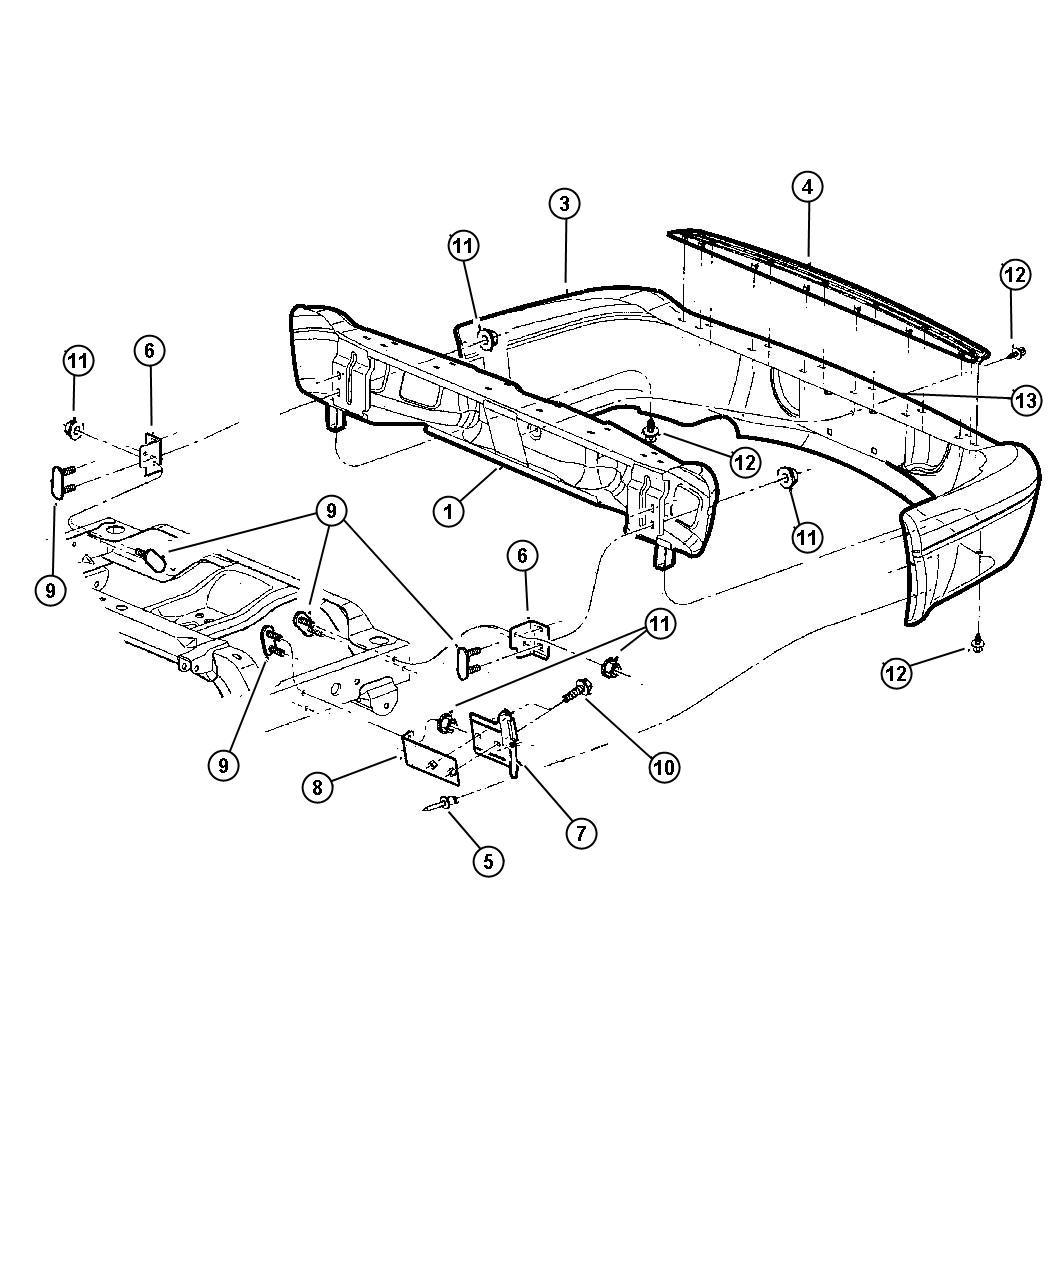 hight resolution of  dodge durango accessories 2001 dodge durango step pad rear bumper